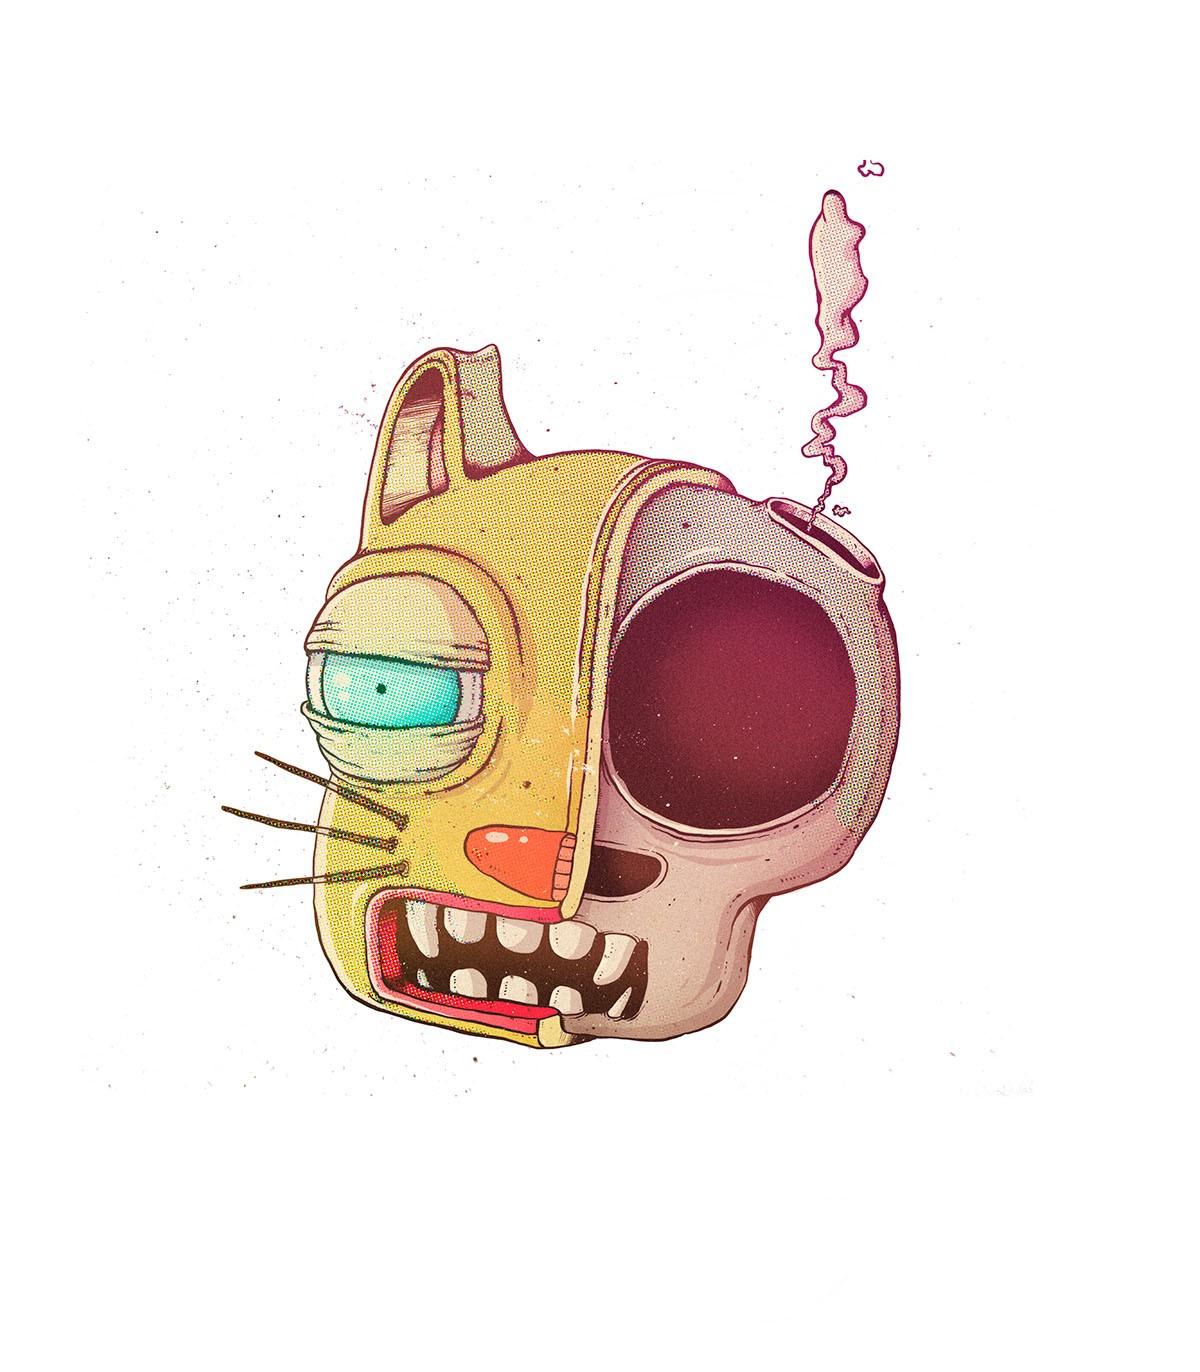 Oscar Llorens 可爱幽默的怪物插画